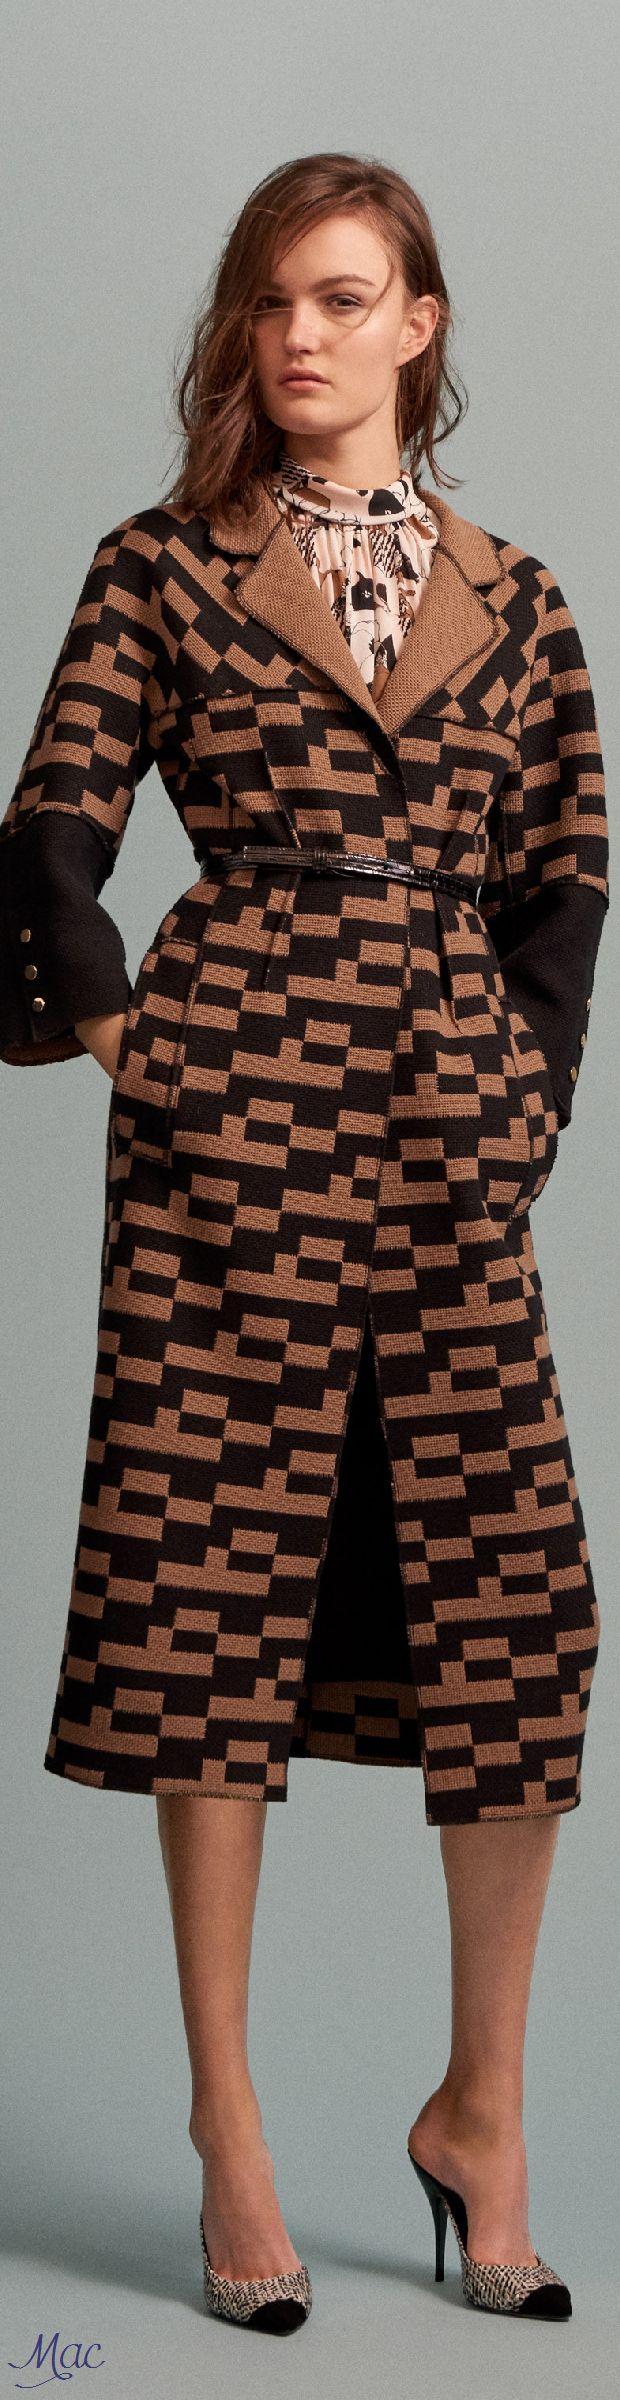 Pre-Fall 2016 Oscar de la Renta  women fashion outfit clothing style apparel @roressclothes closet ideas